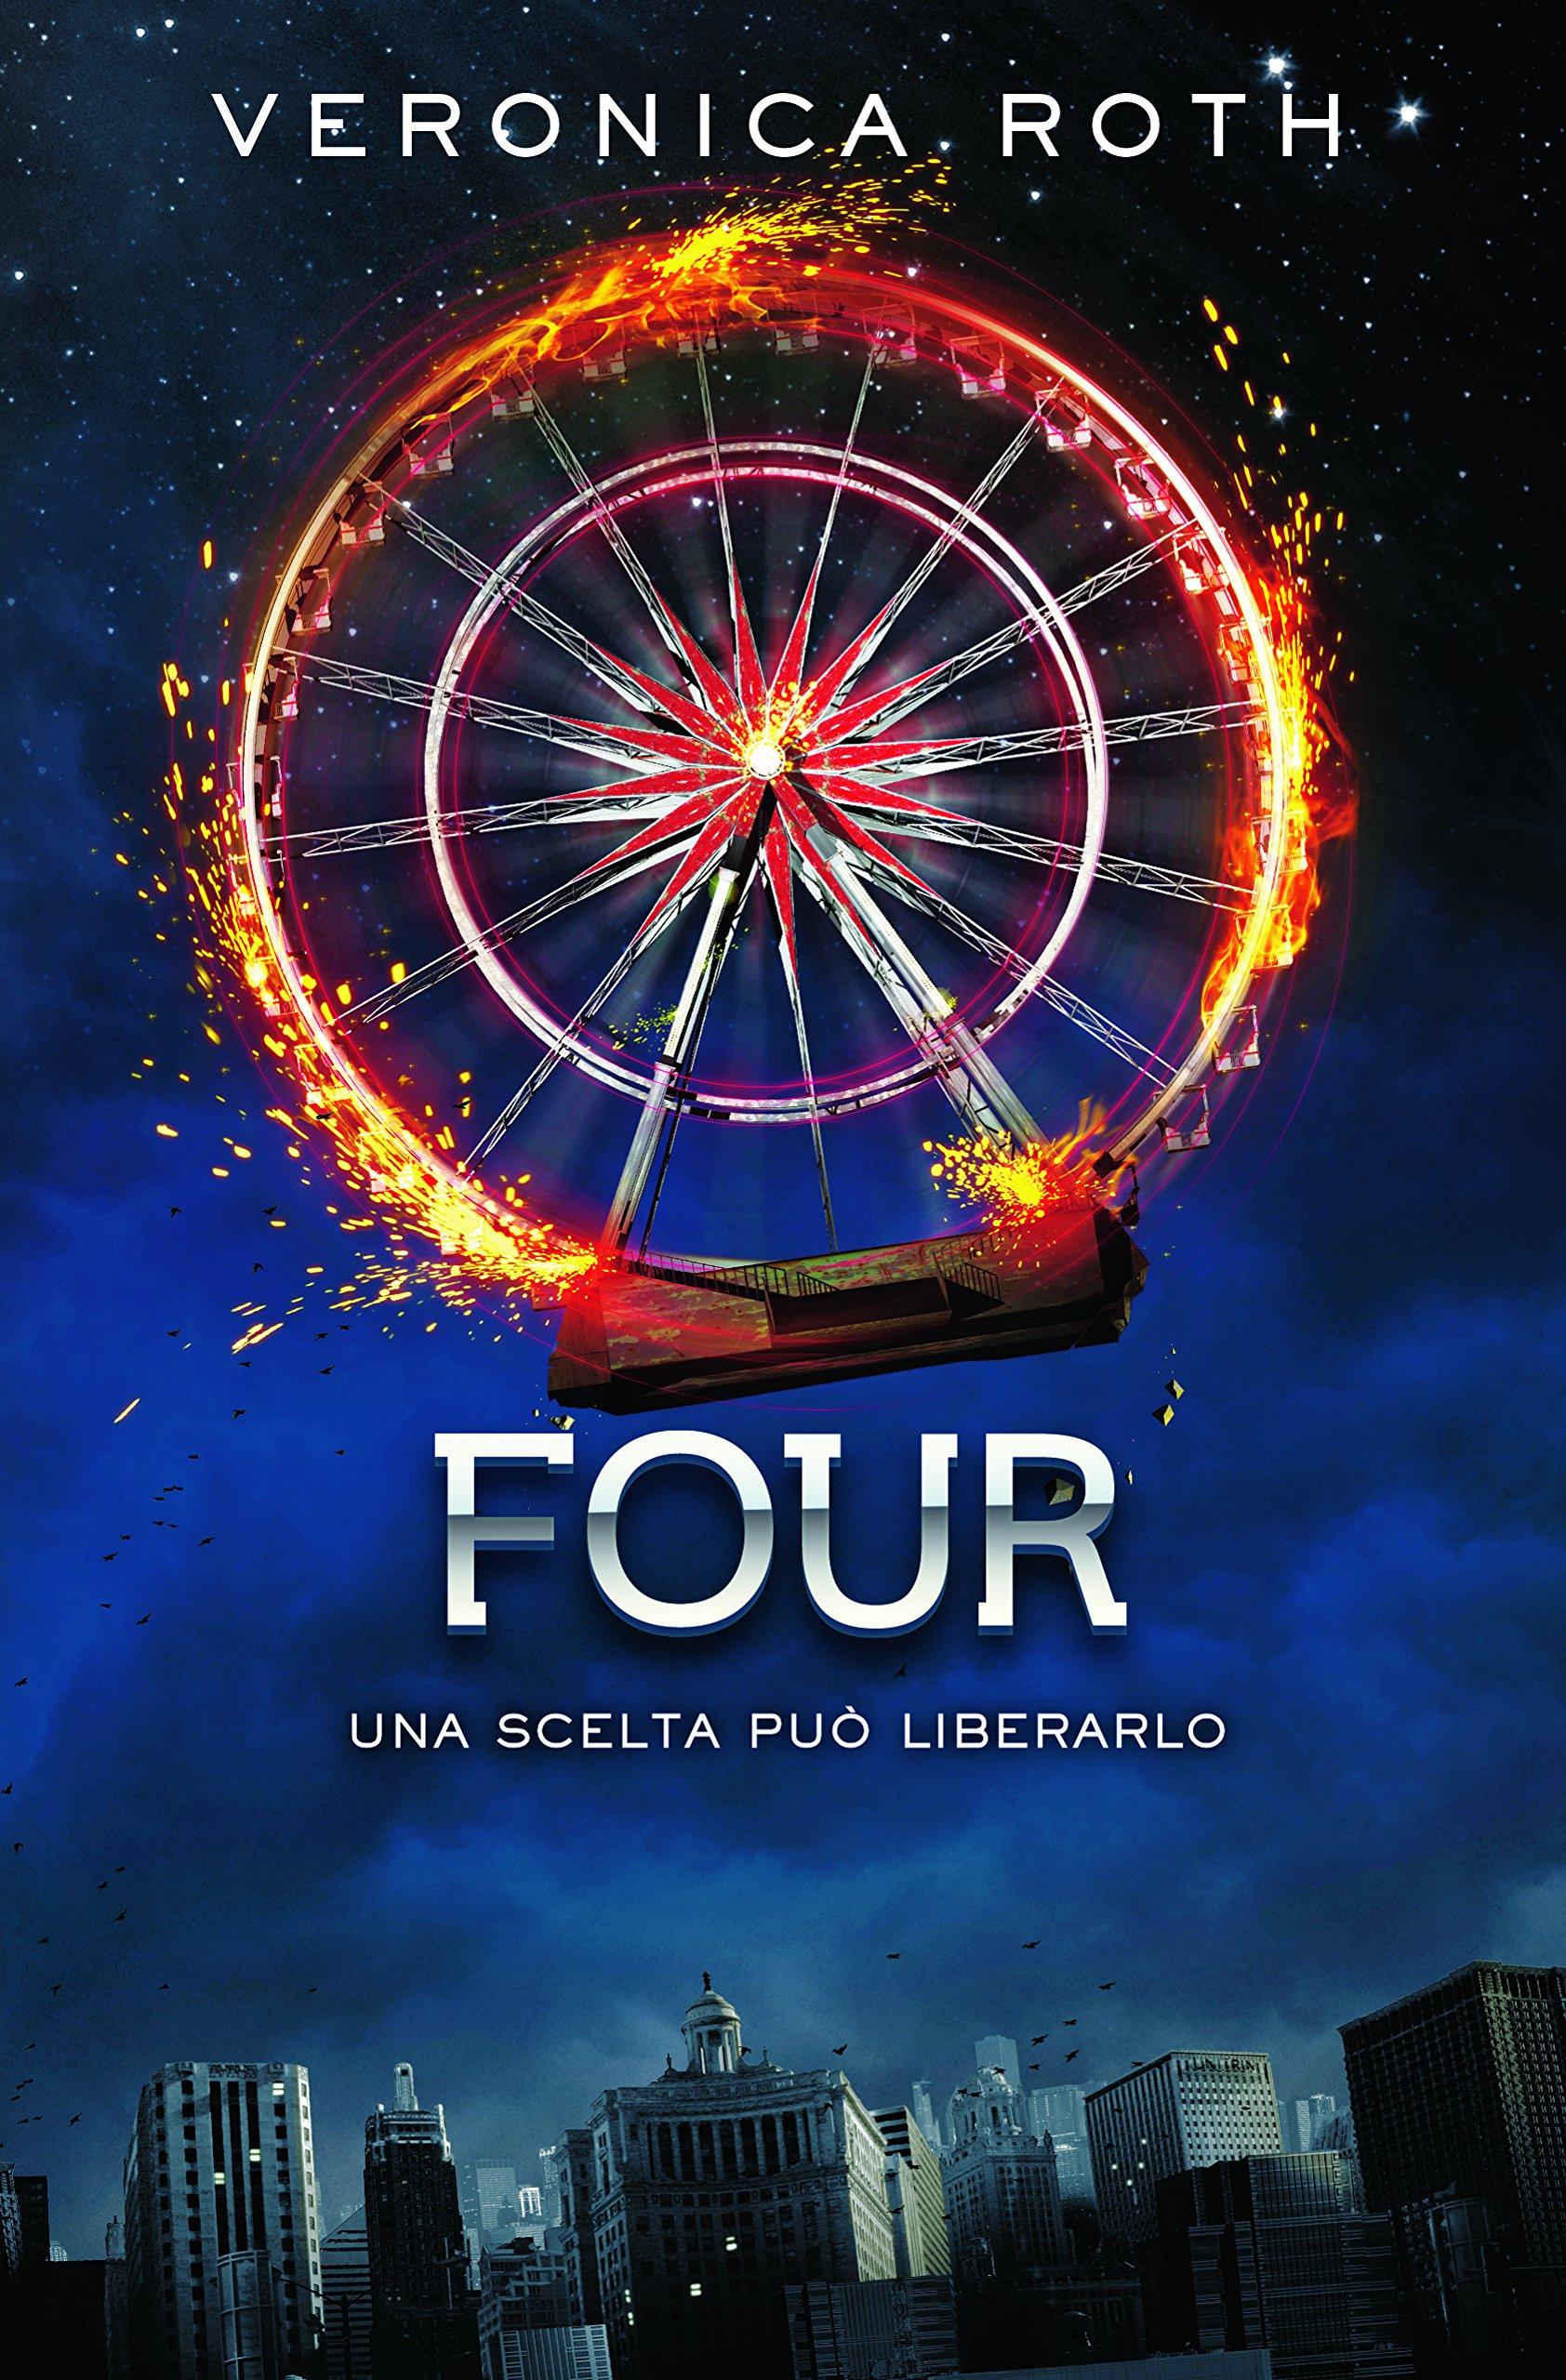 Four, serie Divergent, Veronica Roth.jpg